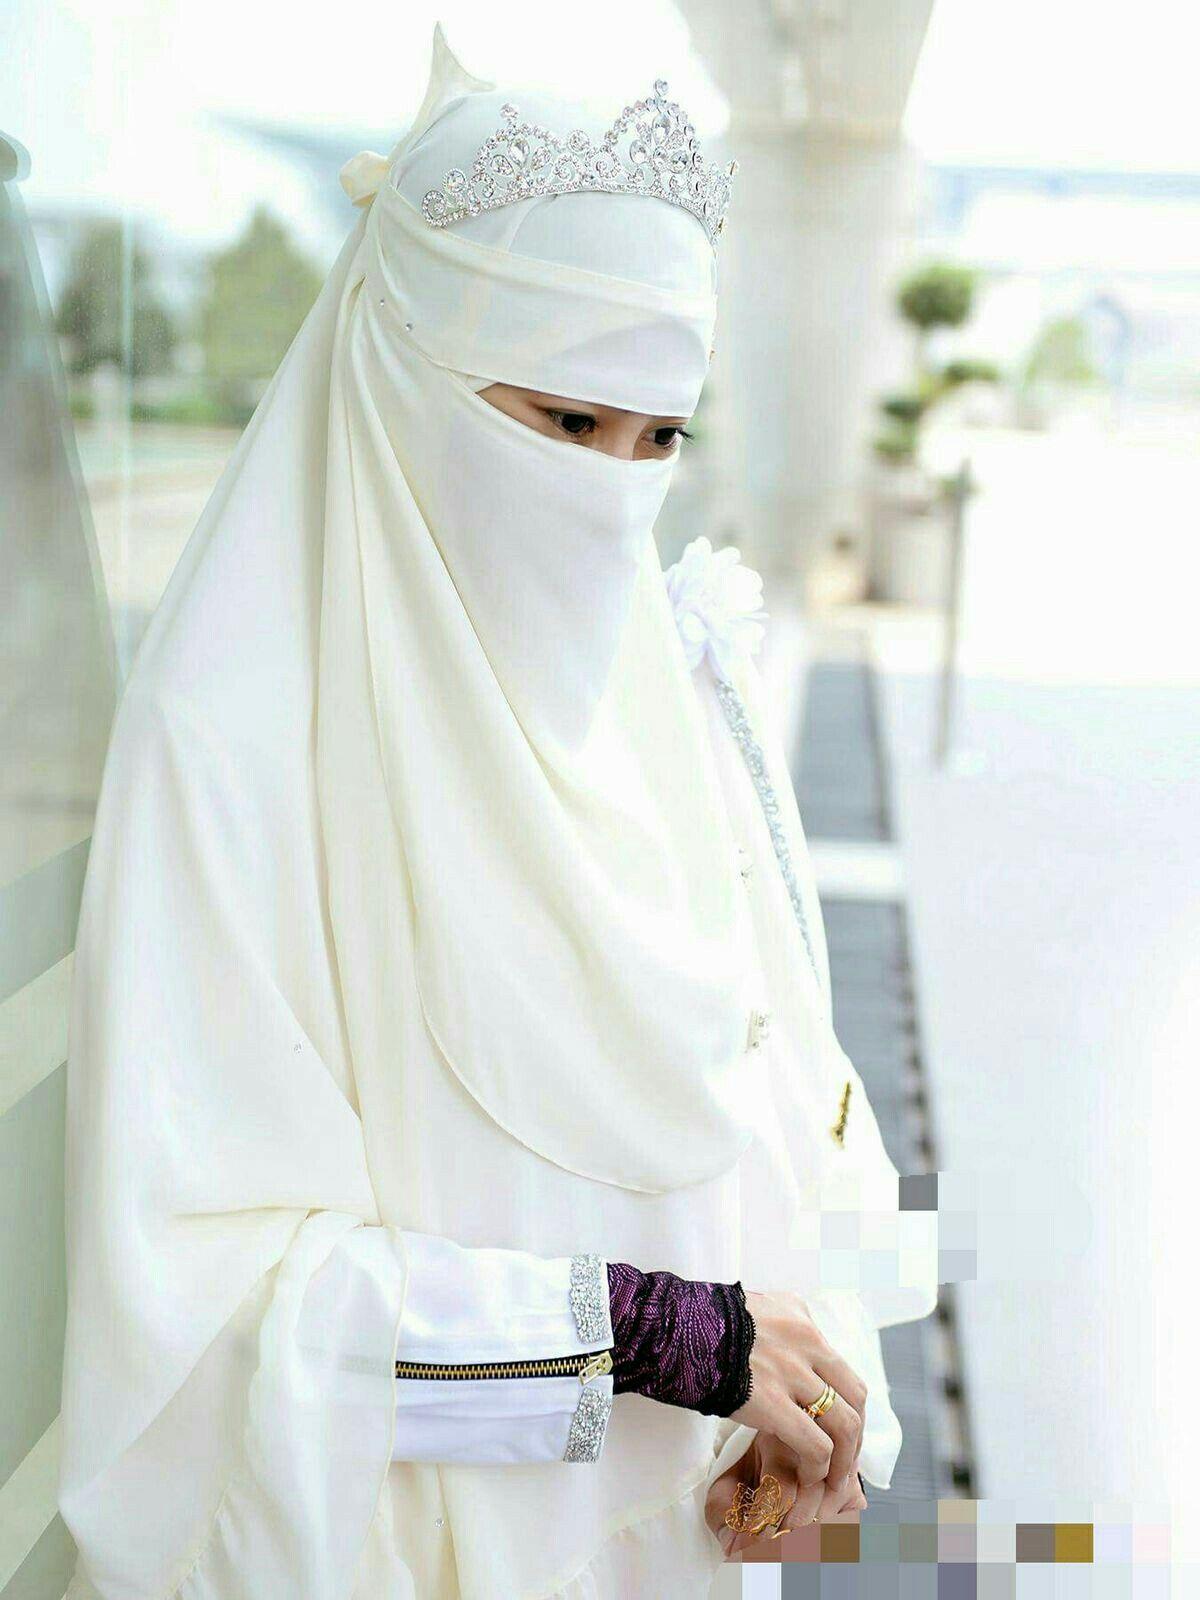 Follow me Aaysha khan 💕🤘💕  Pengantin, Wanita, Baju pengantin